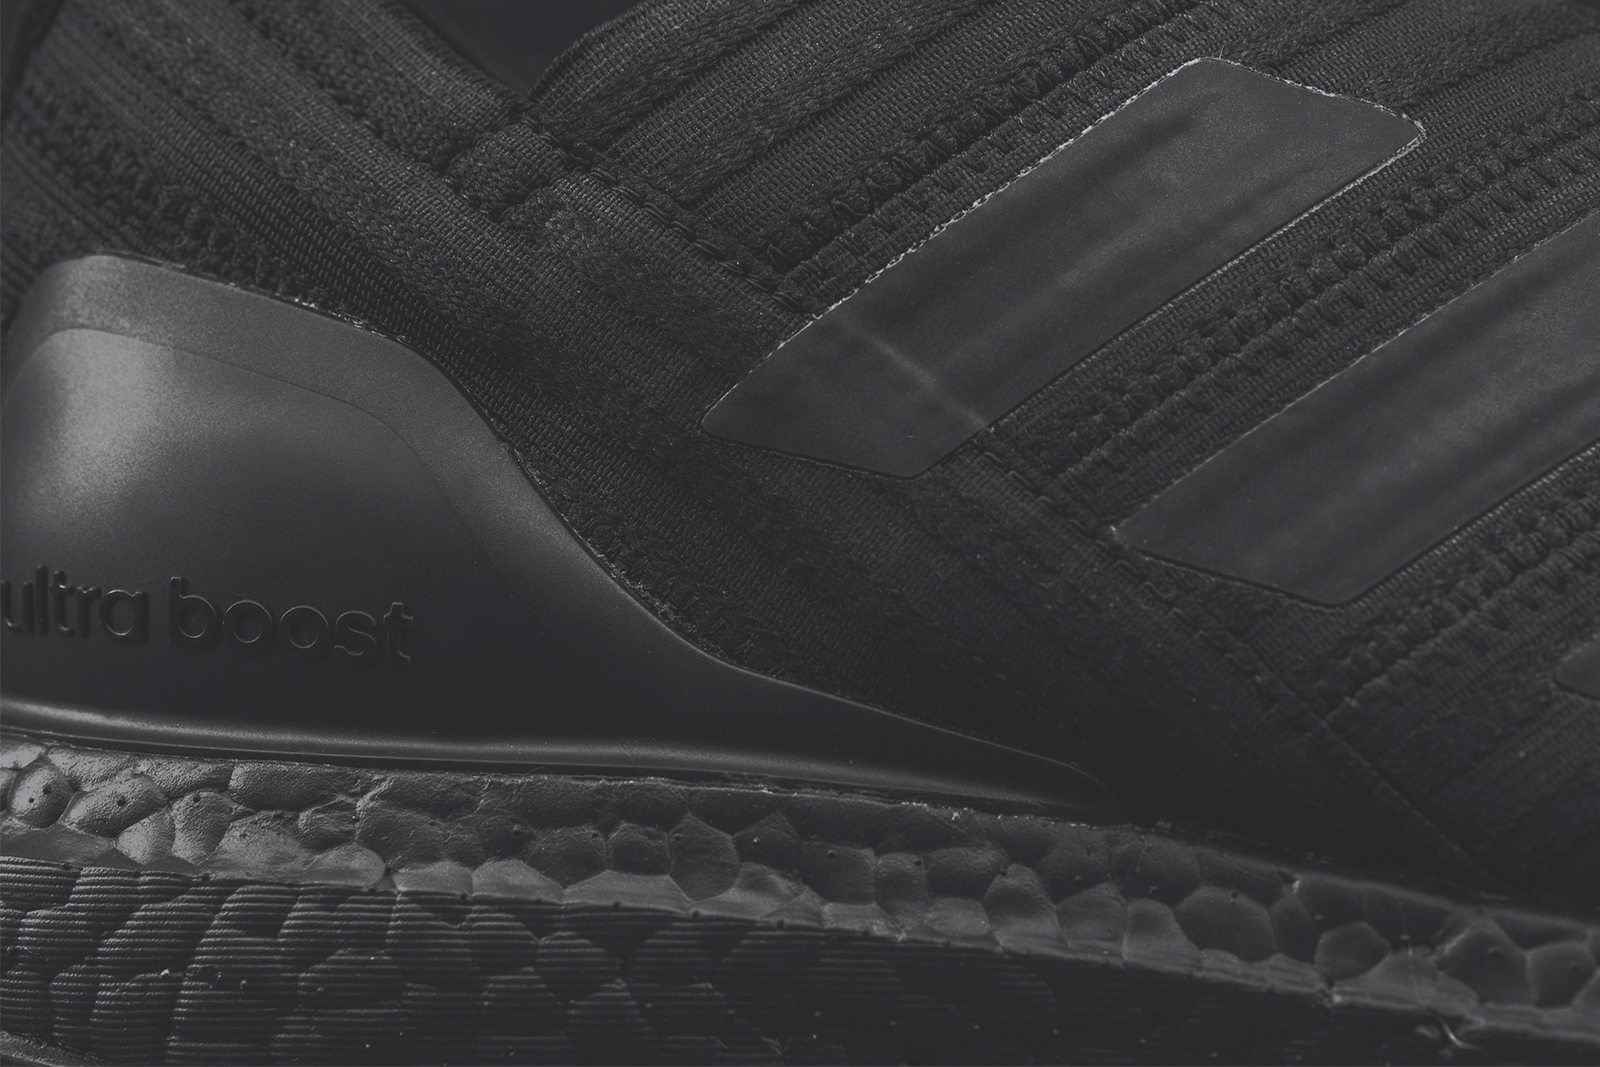 d7c14b1d5f863 ... Adidas x KITH Nemeziz UltraBOOST 17+